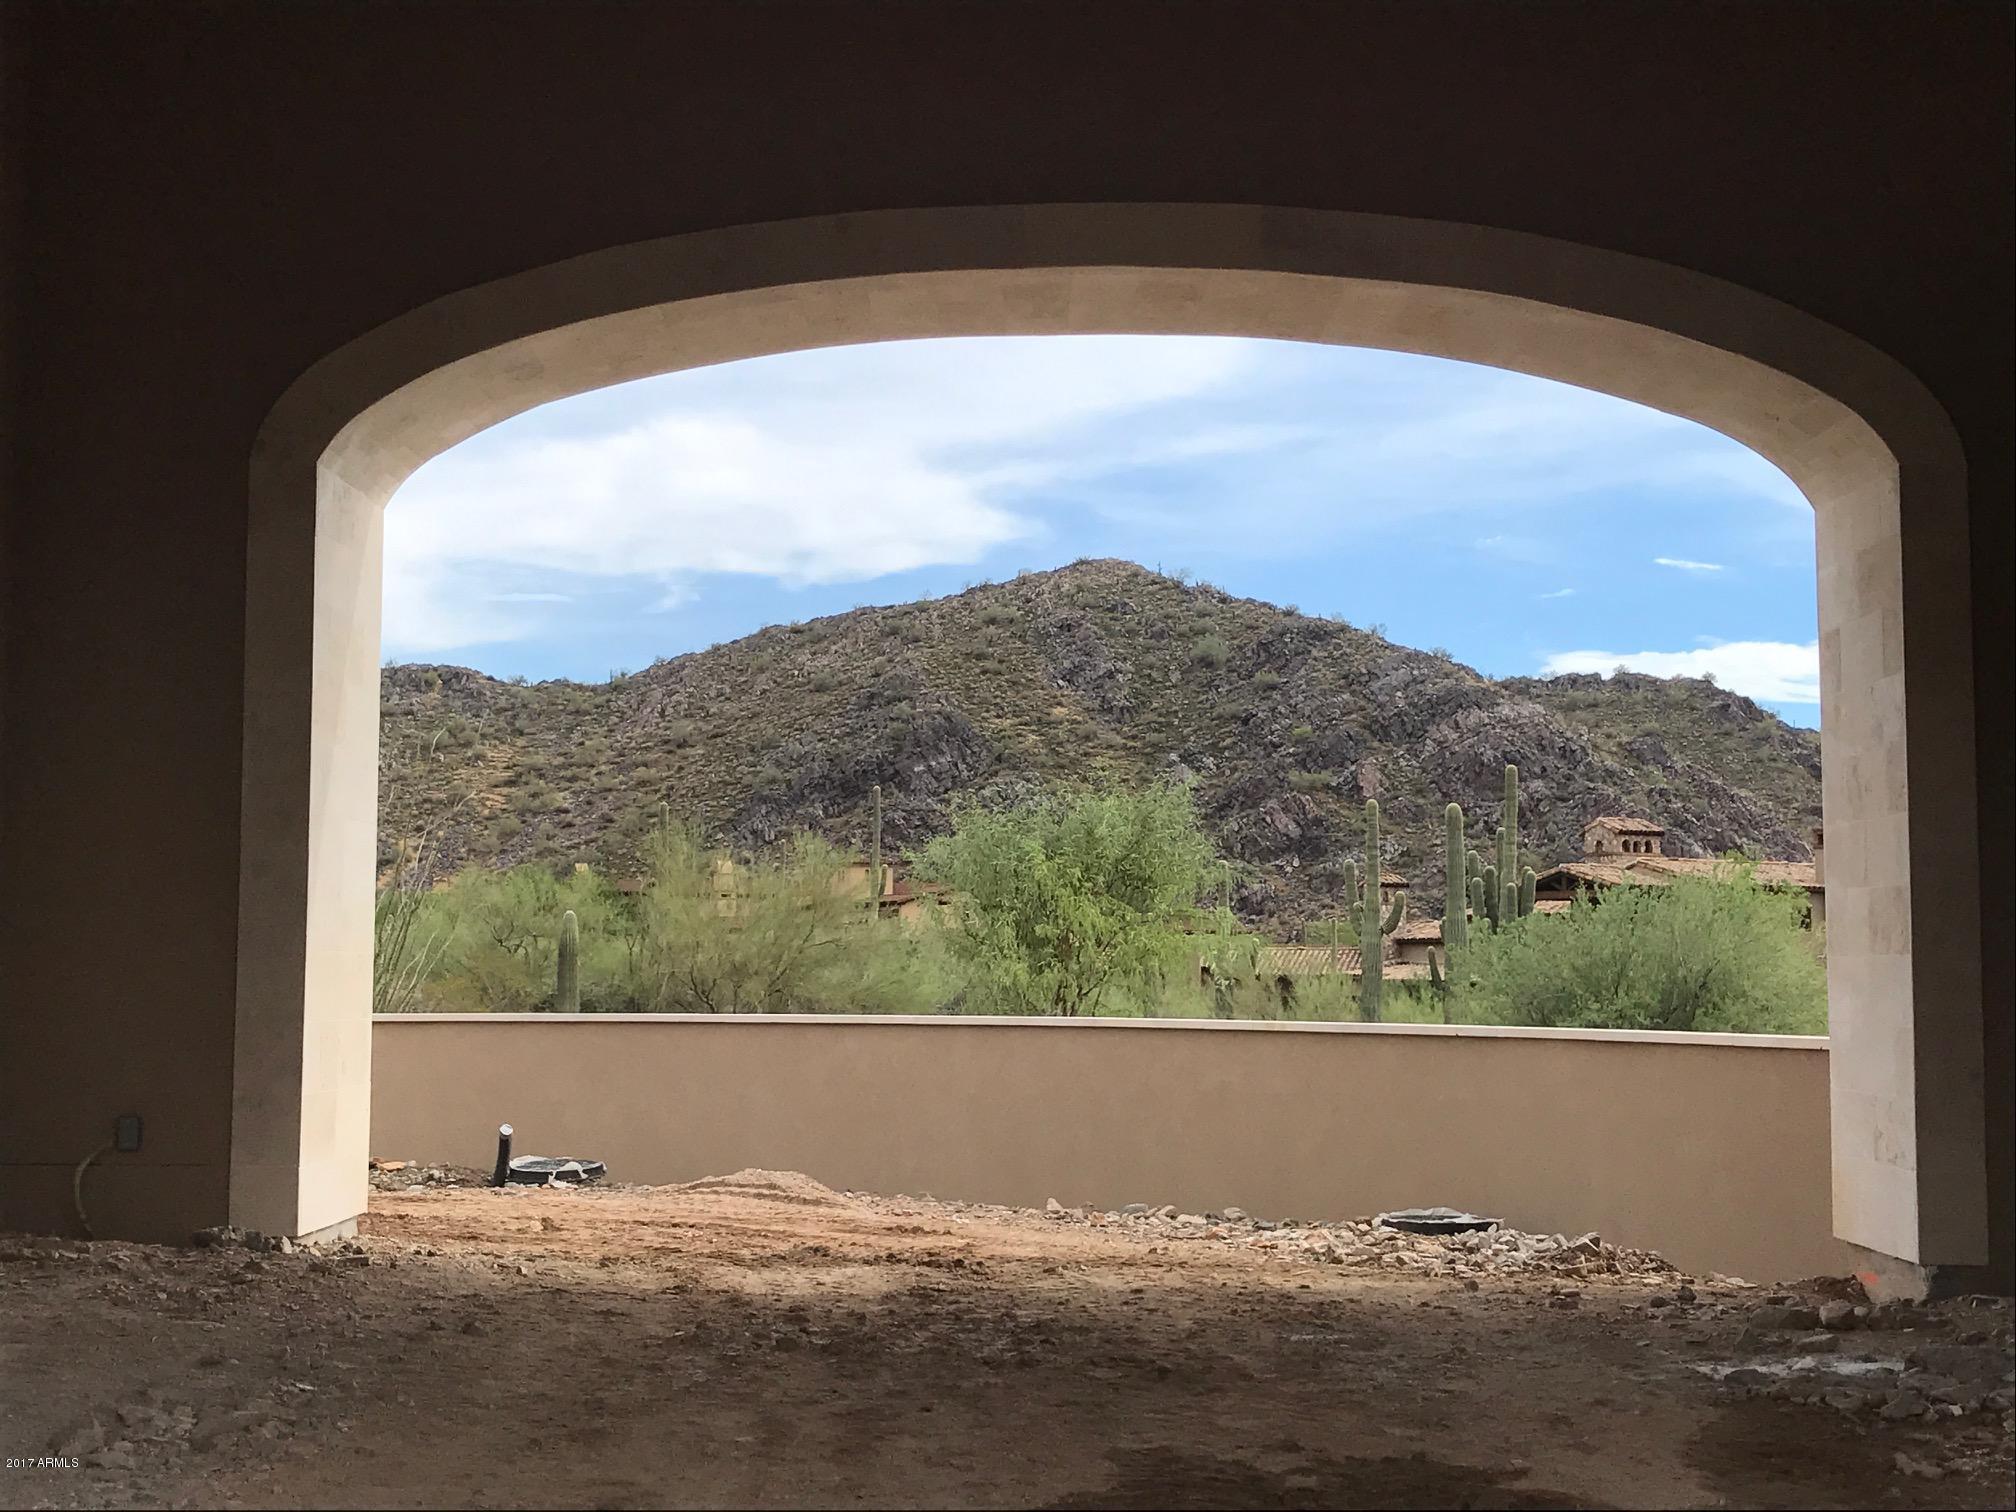 MLS 5635301 10856 E WINDGATE PASS Drive, Scottsdale, AZ 85255 Scottsdale AZ Four Bedroom